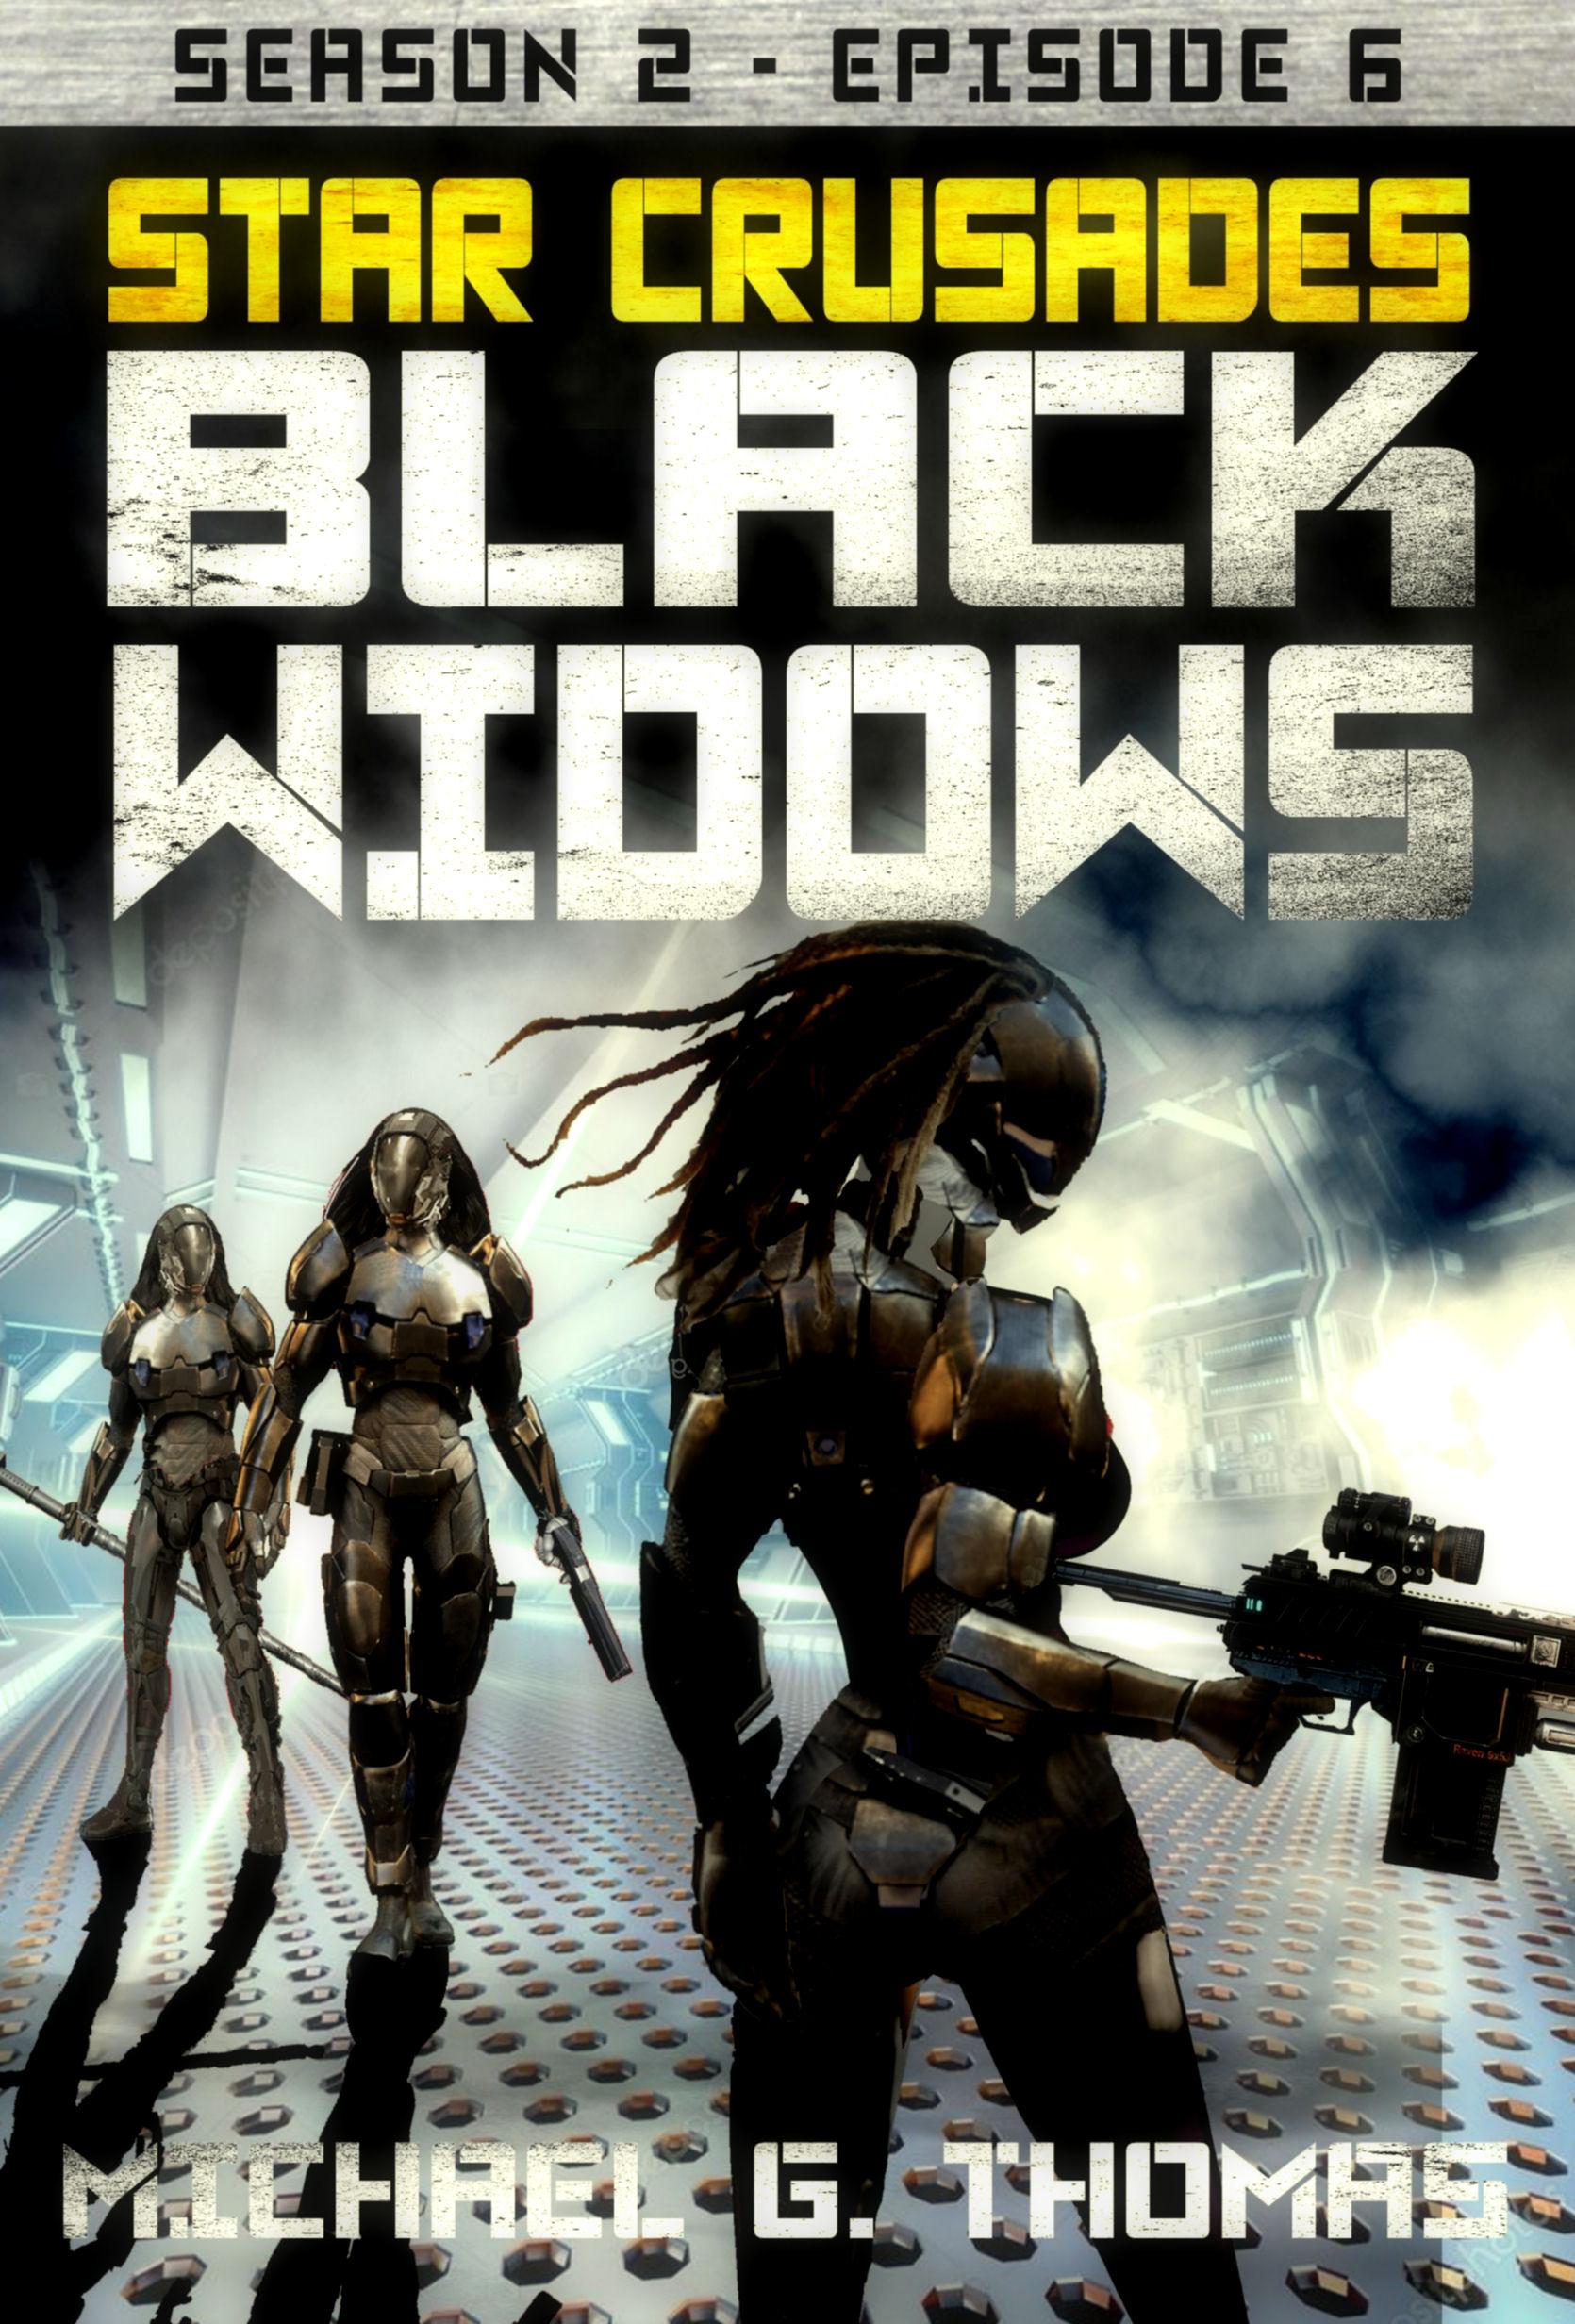 Star Crusades: Black Widows - Season 2: Episode 6, an Ebook by Michael G   Thomas